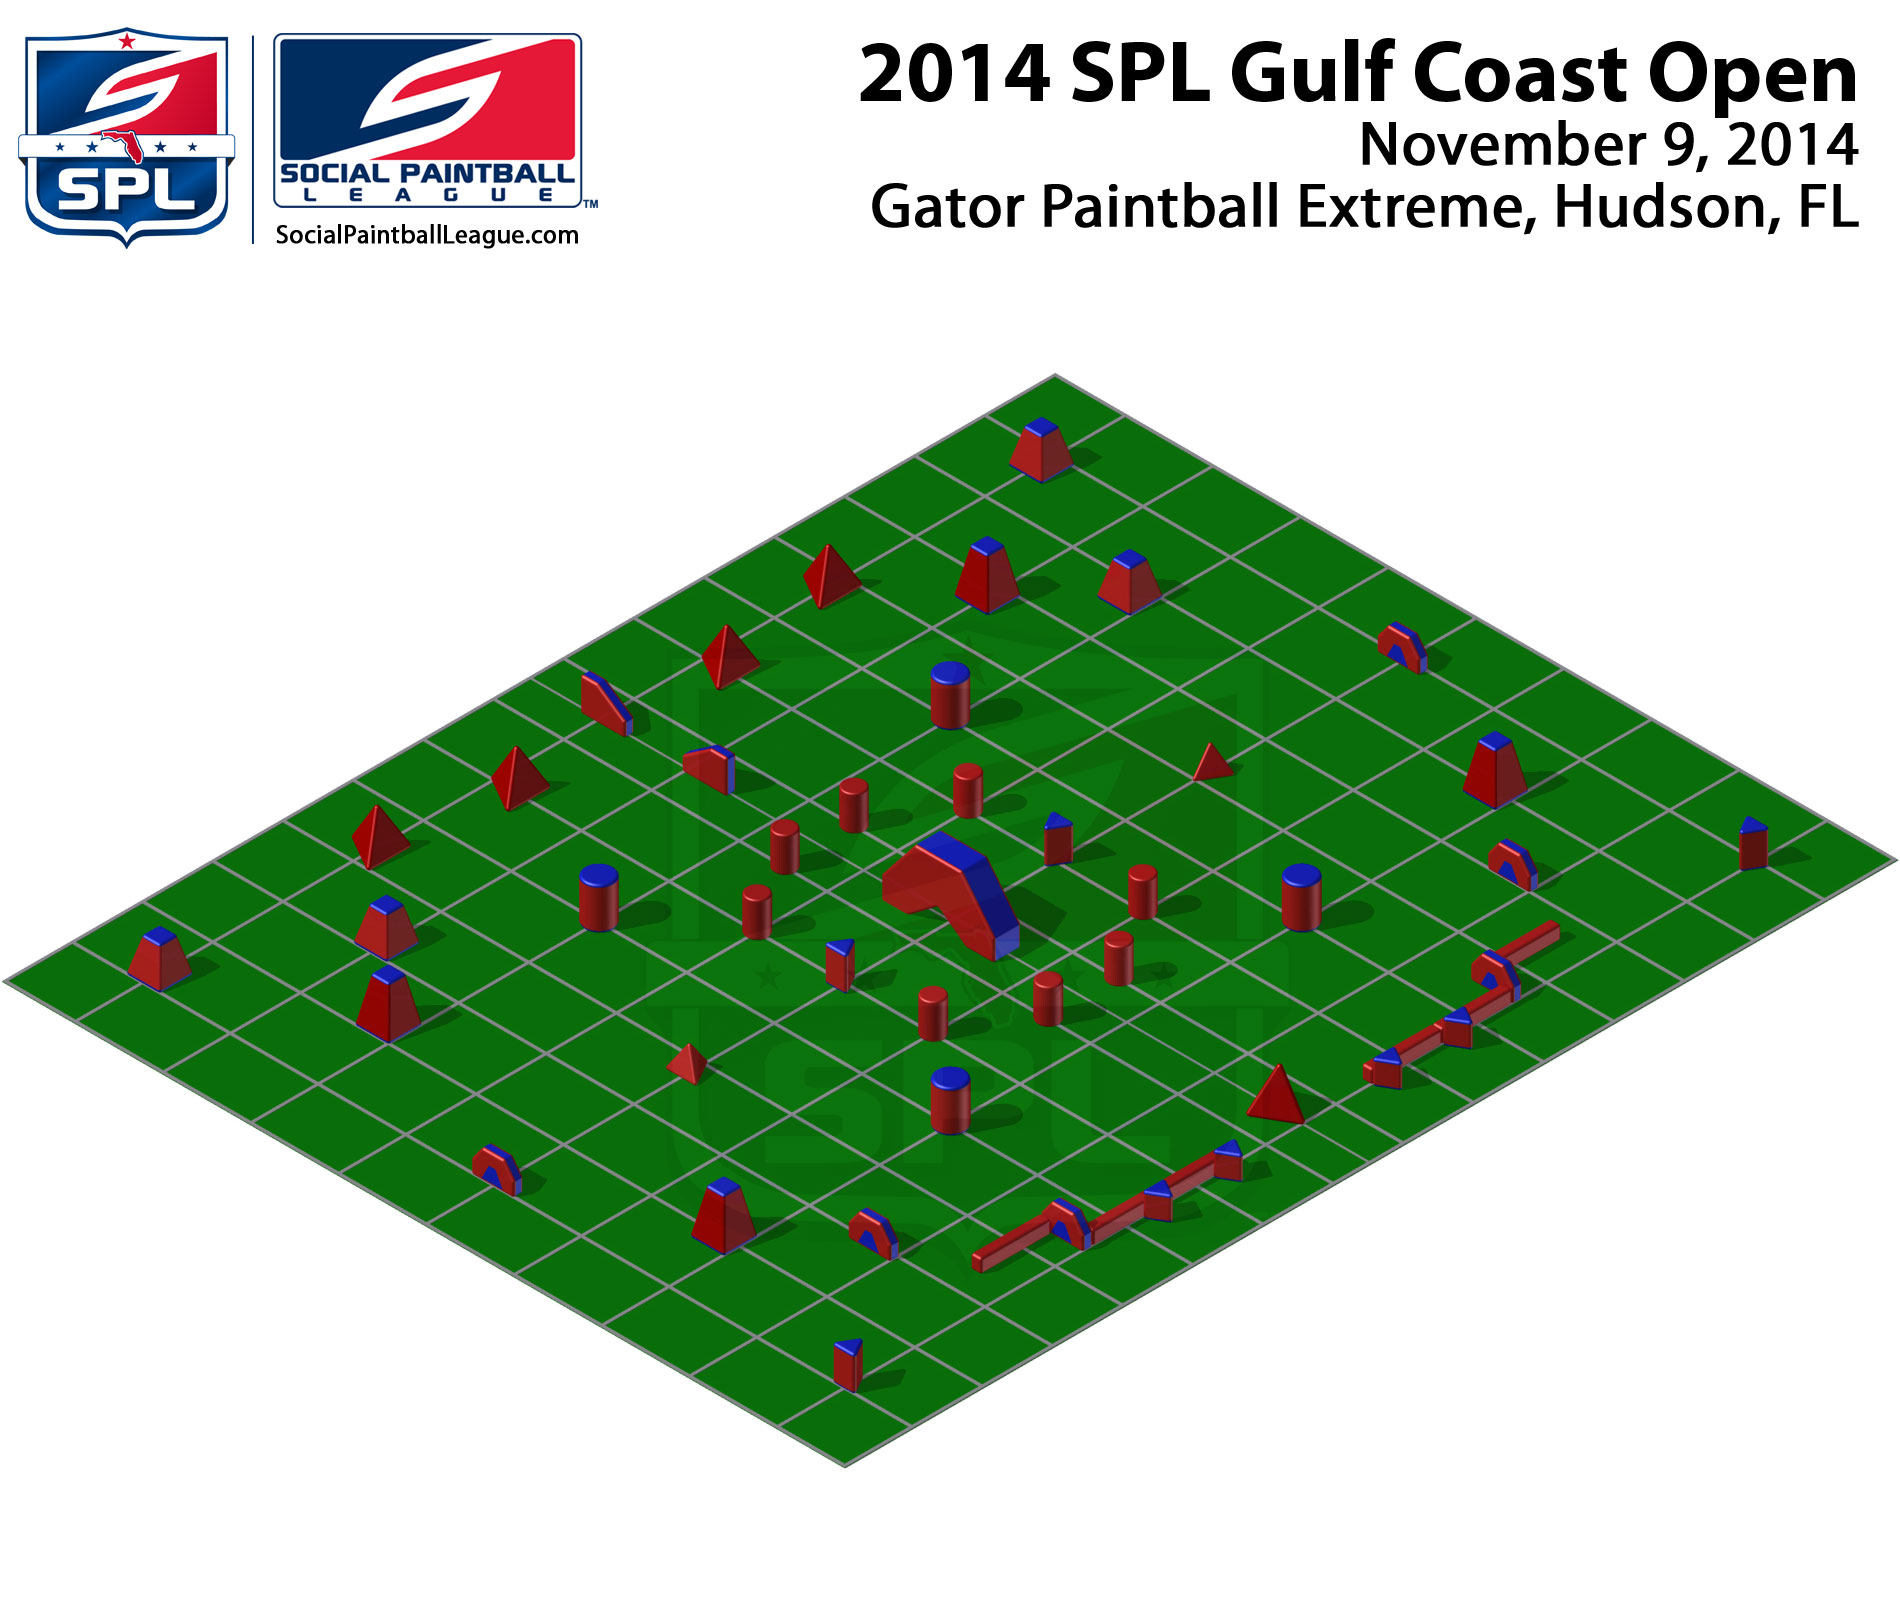 2014 SPL GCO layout